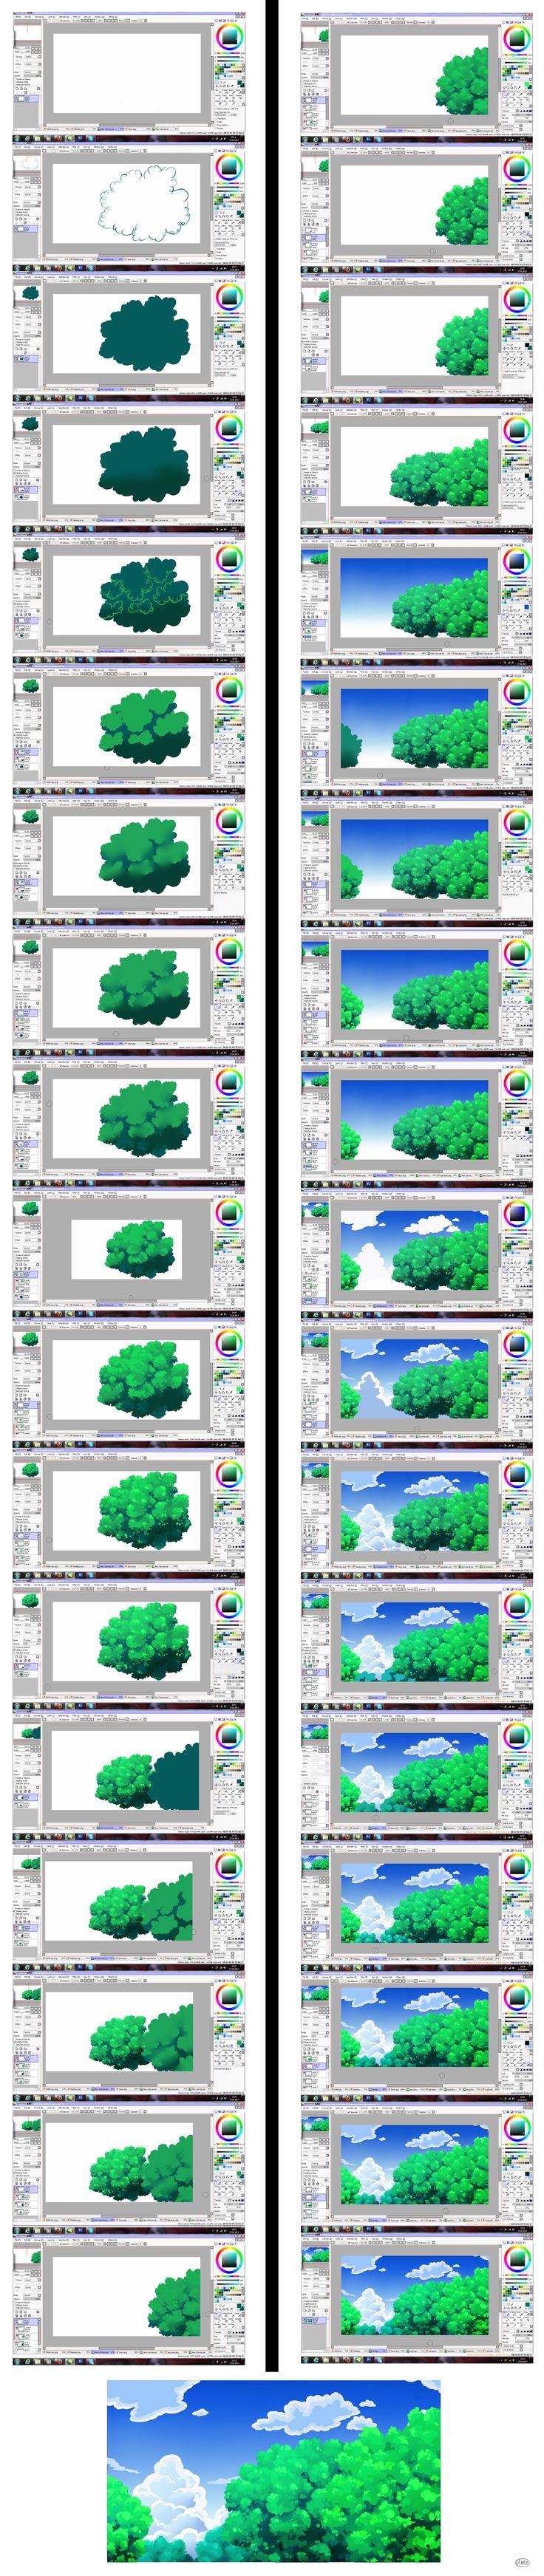 Pokemon Background Tutorial - Sky and Trees by MinaCookie.deviantart.com on @deviantART